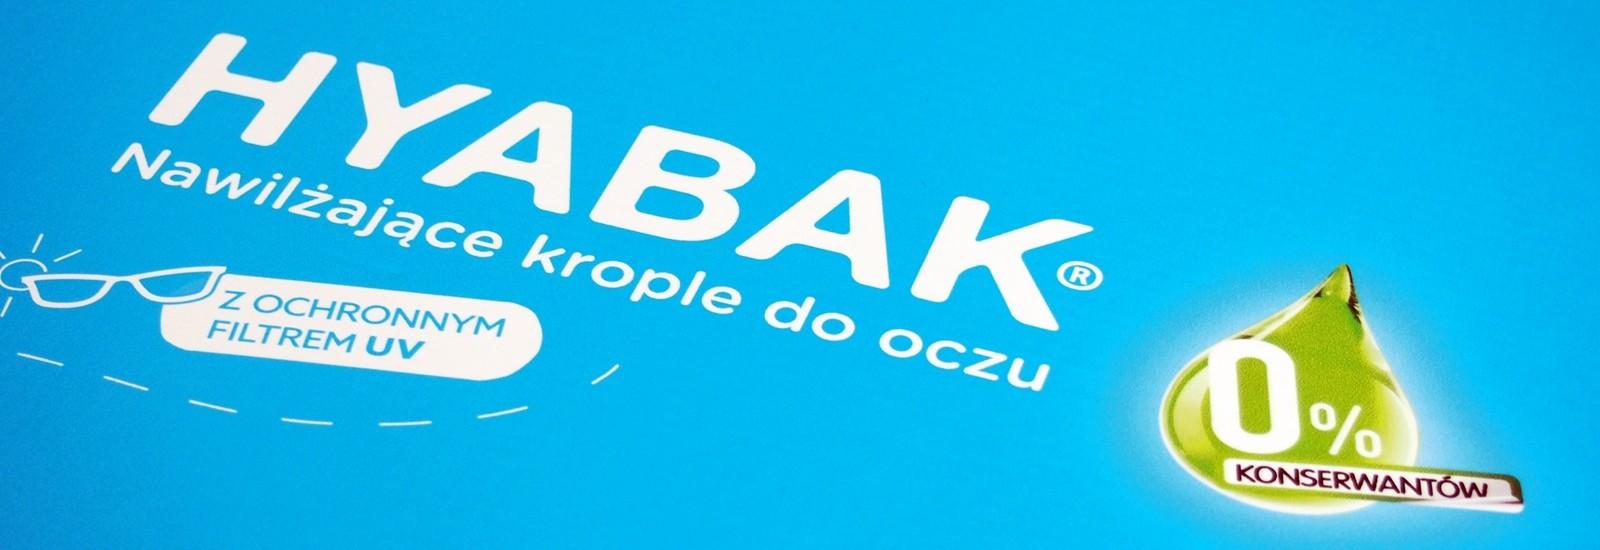 hyabak_krople_do_oczu_tlo